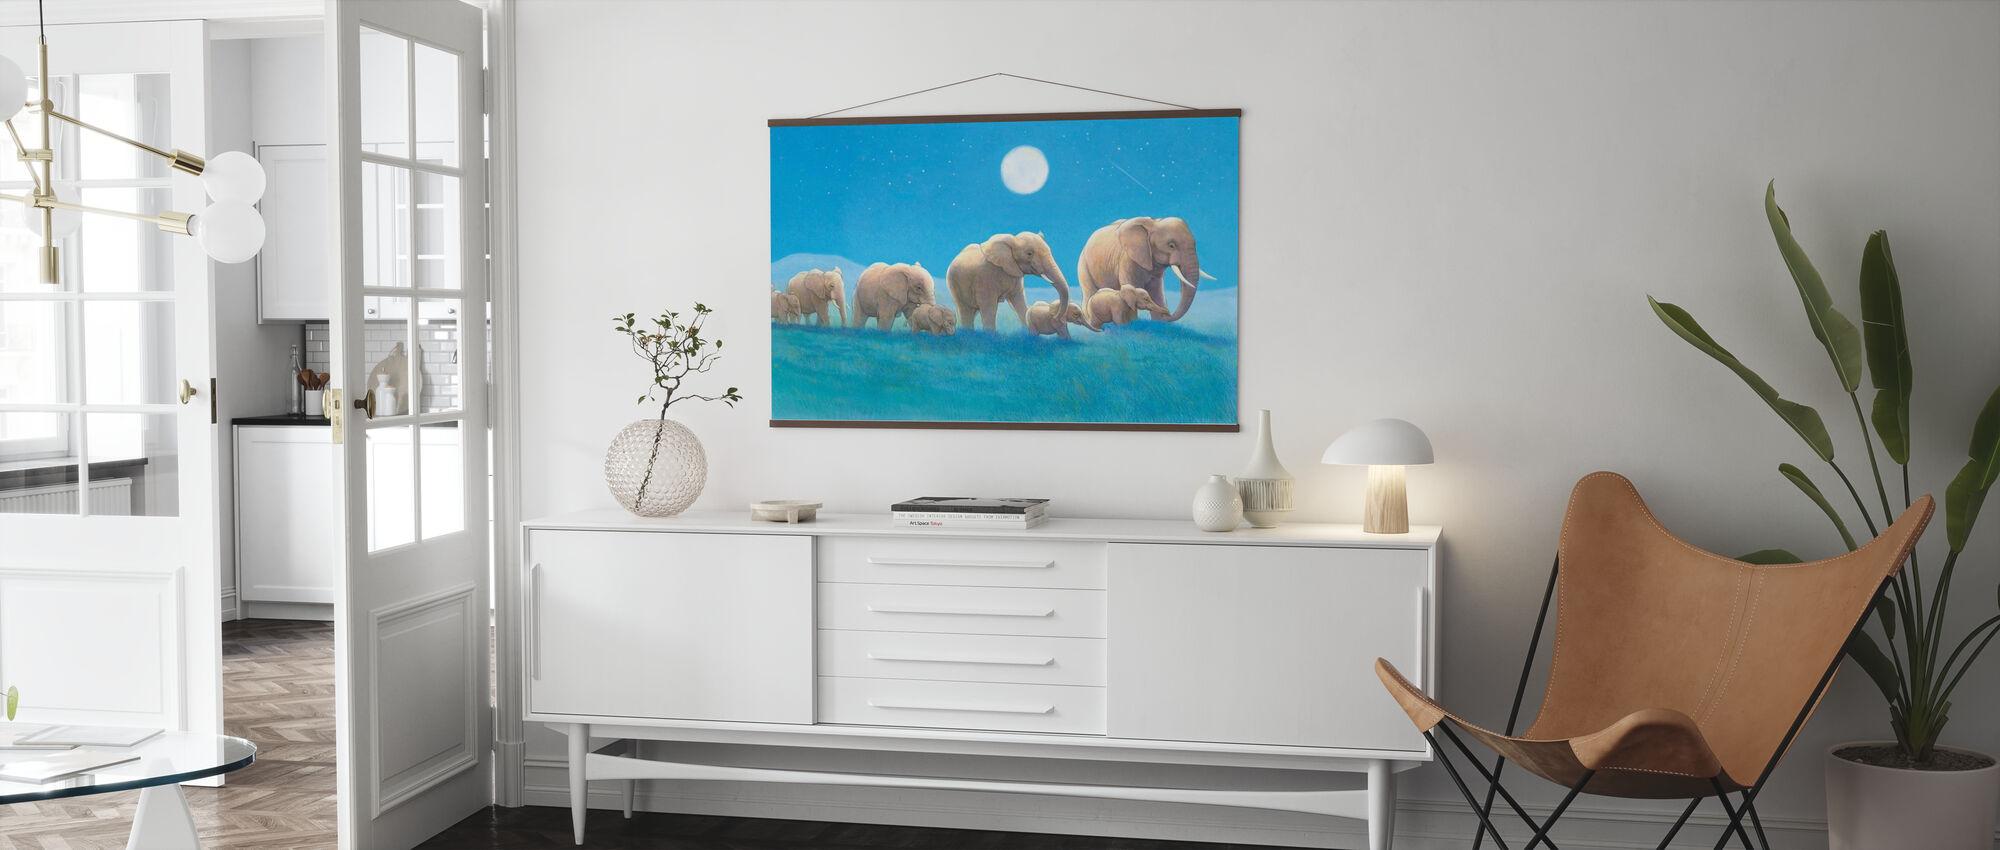 Elefanter Walk - Plakat - Stue